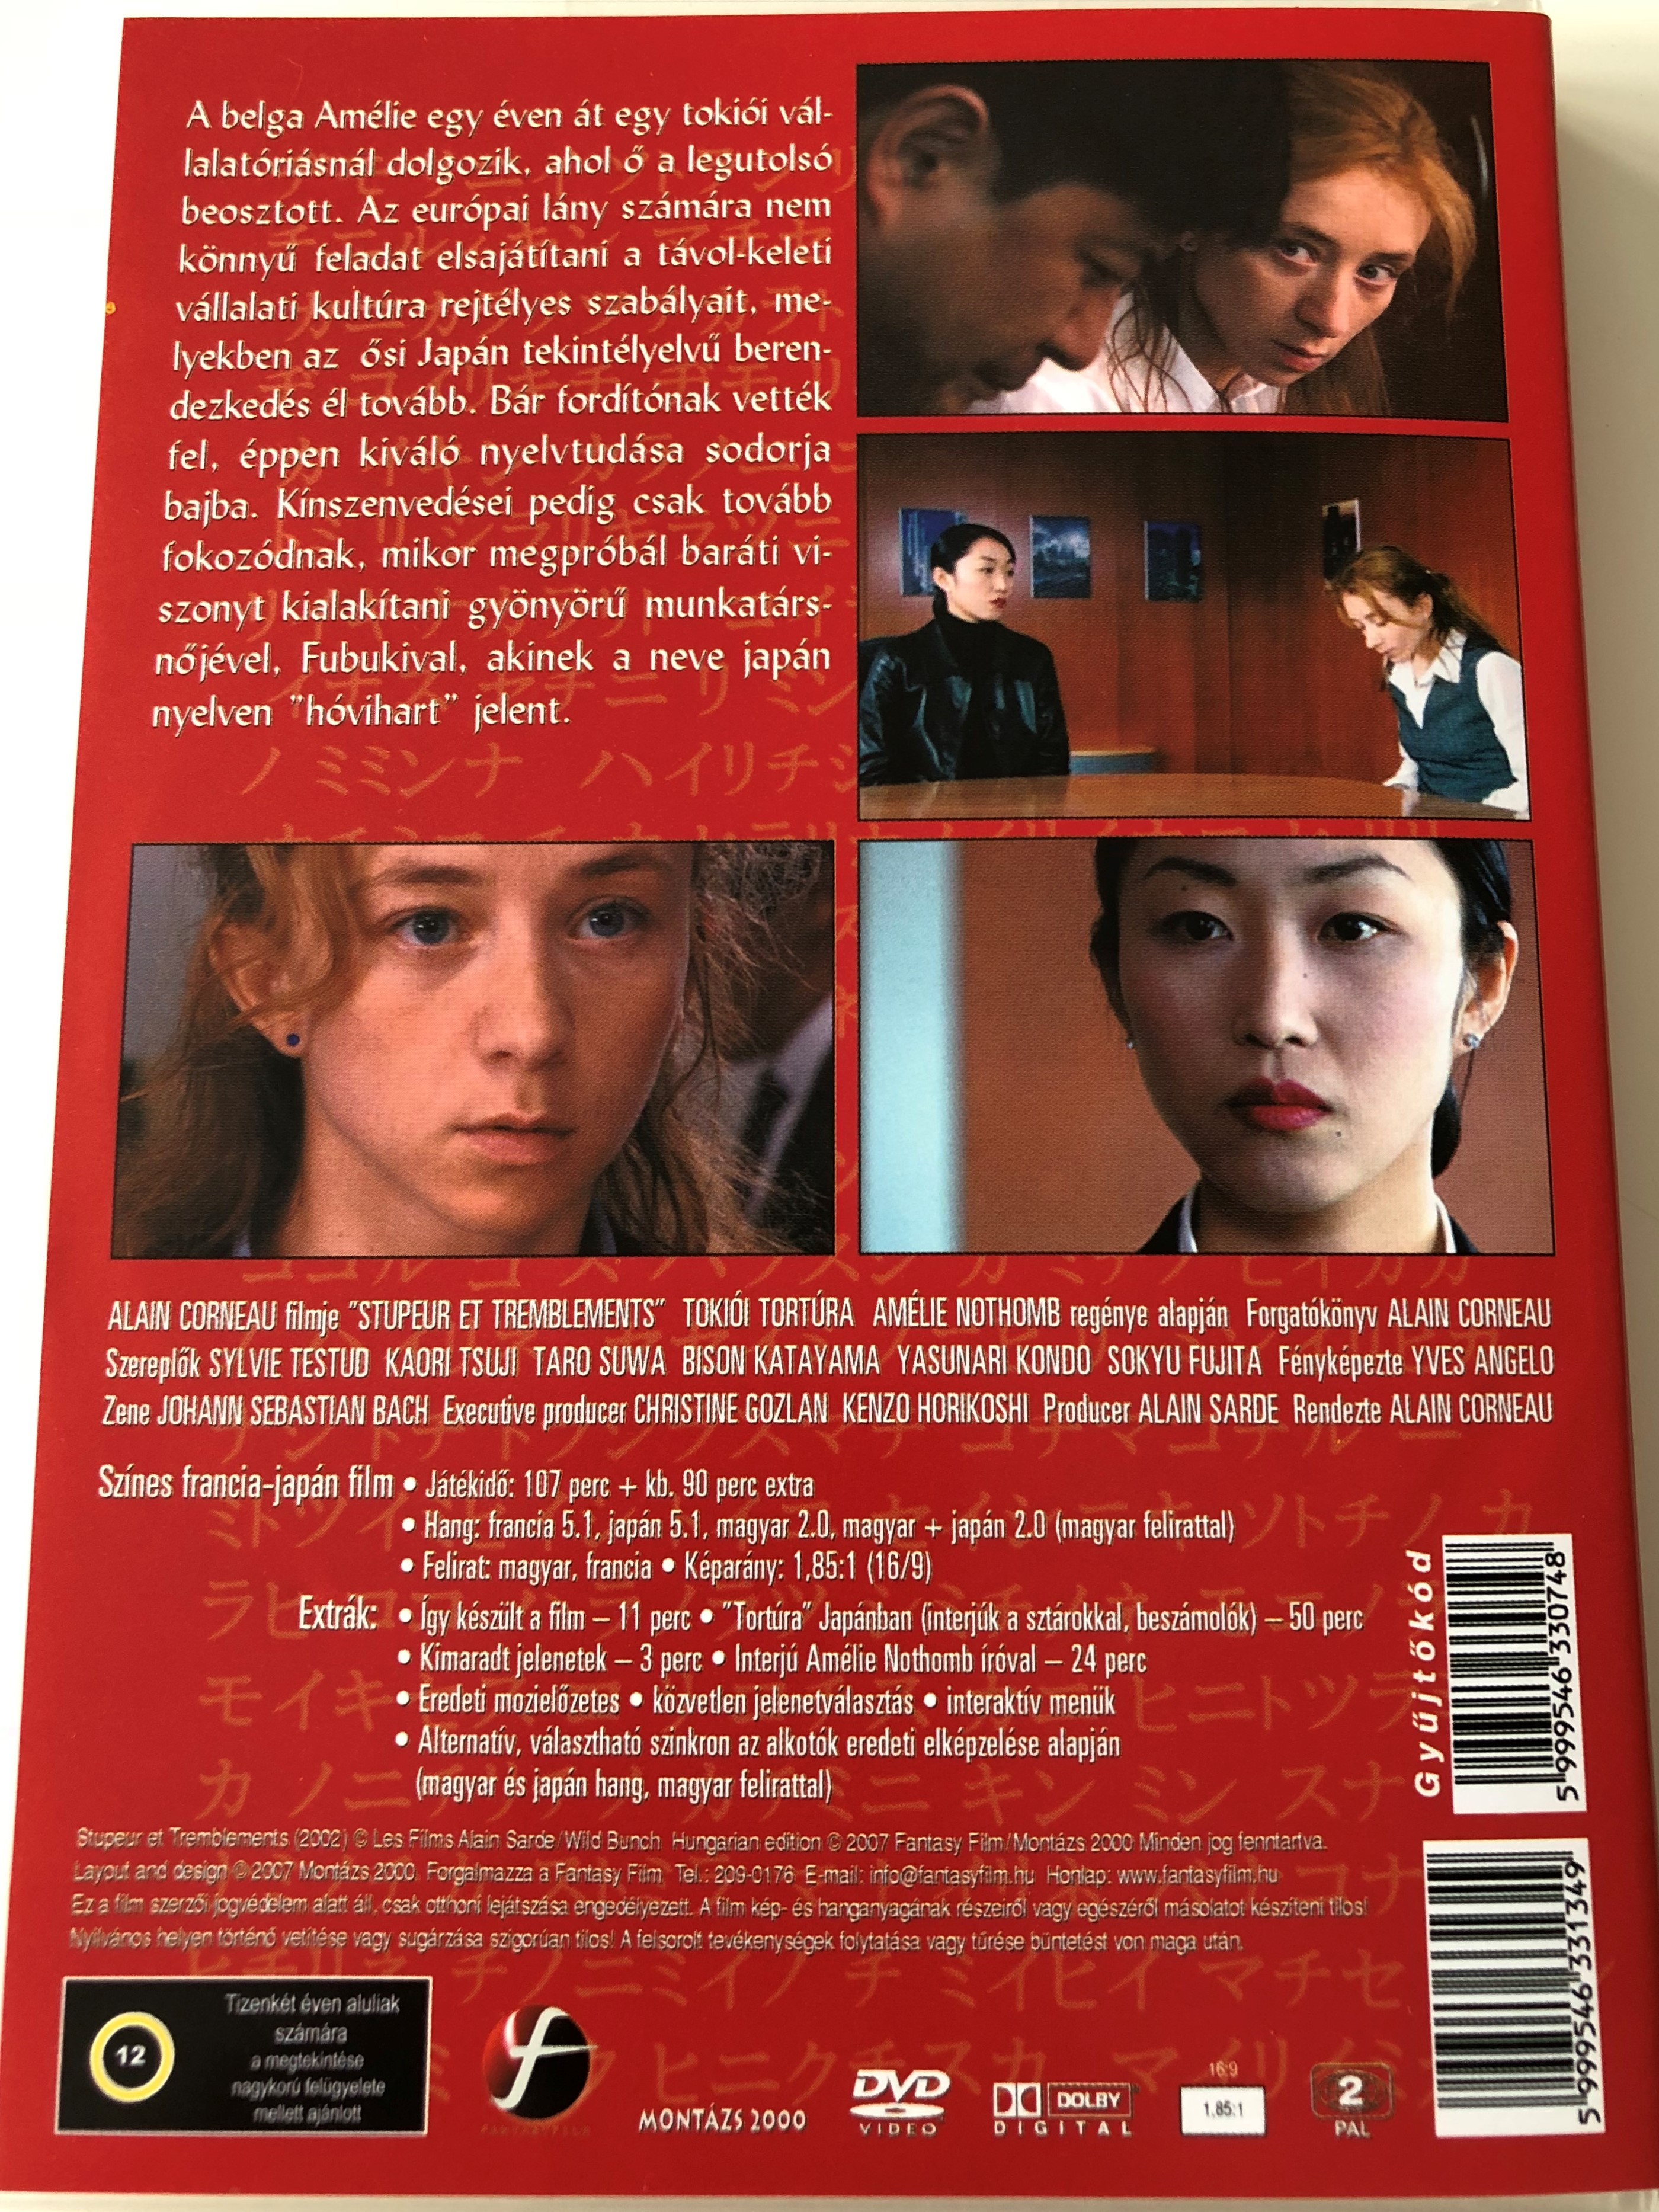 stupeur-et-tremblements-fear-and-trembling-dvd-2003-a-toki-i-tort-ra-directed-by-alain-corneau-starring-sylvie-testud-kaori-tsuji-taro-suwa-bison-katayama-2-.jpg